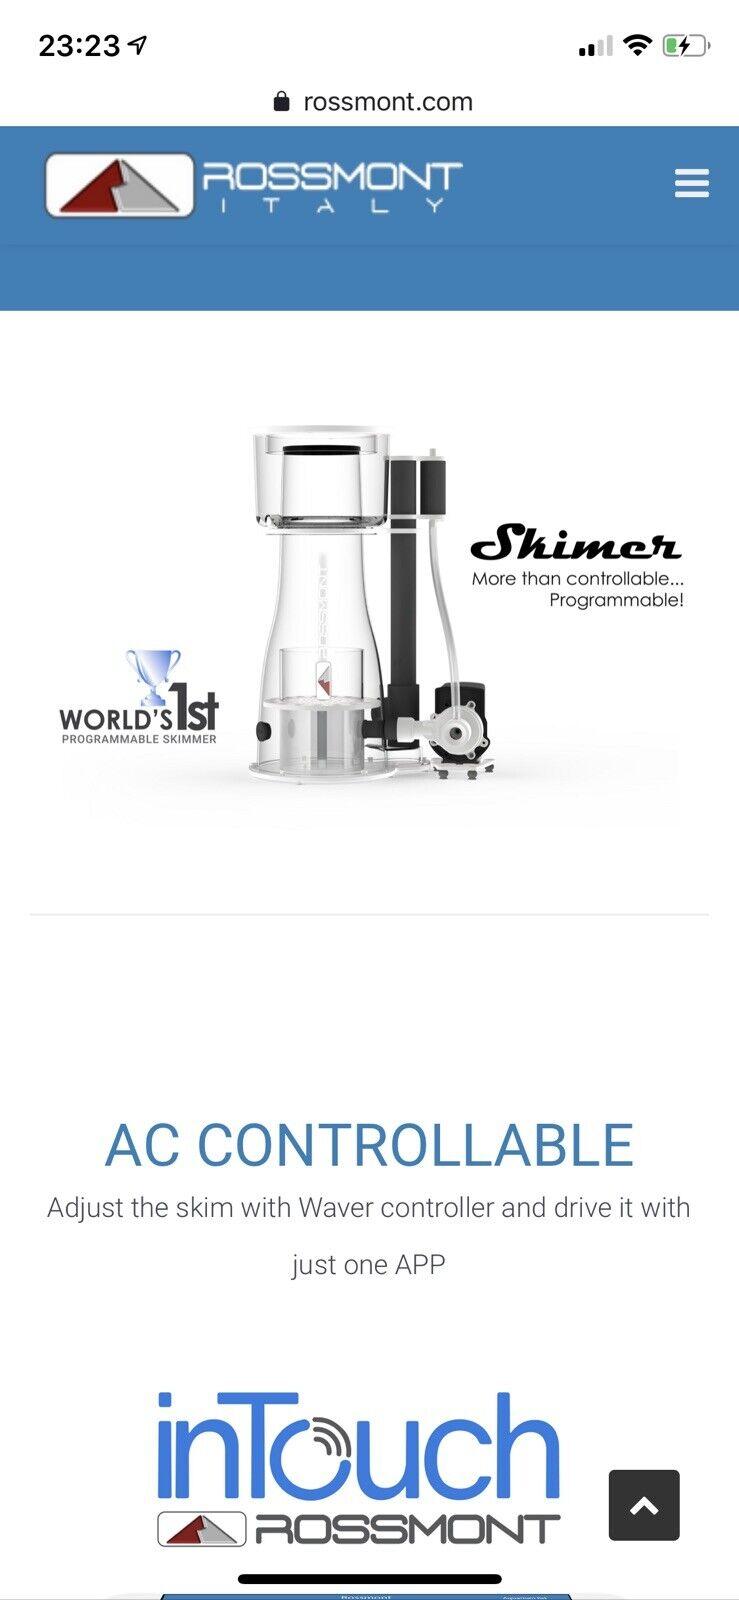 Rossmont Protein Skimmer And Controller SX1000 Marine Aquarium Pump